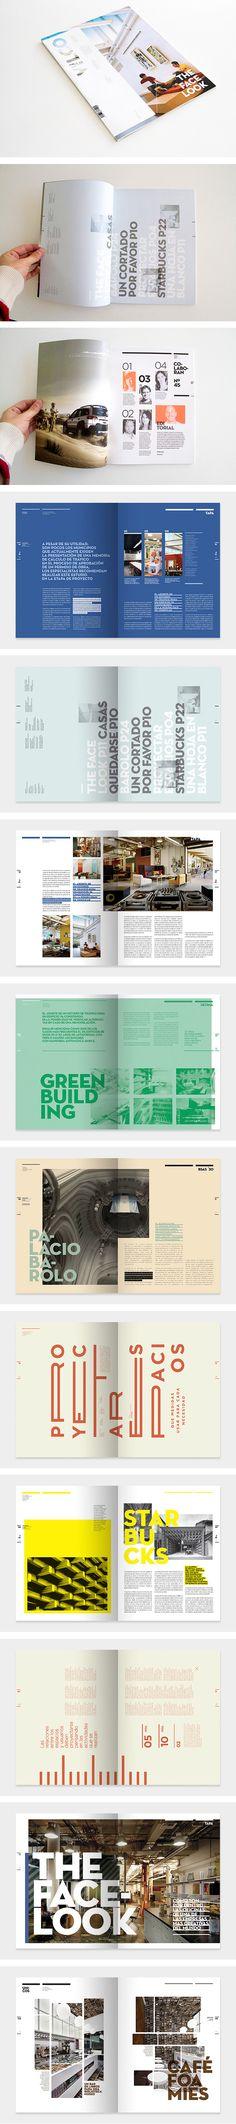 revista de arquitectura #brochure #magazine #print #editorial #design